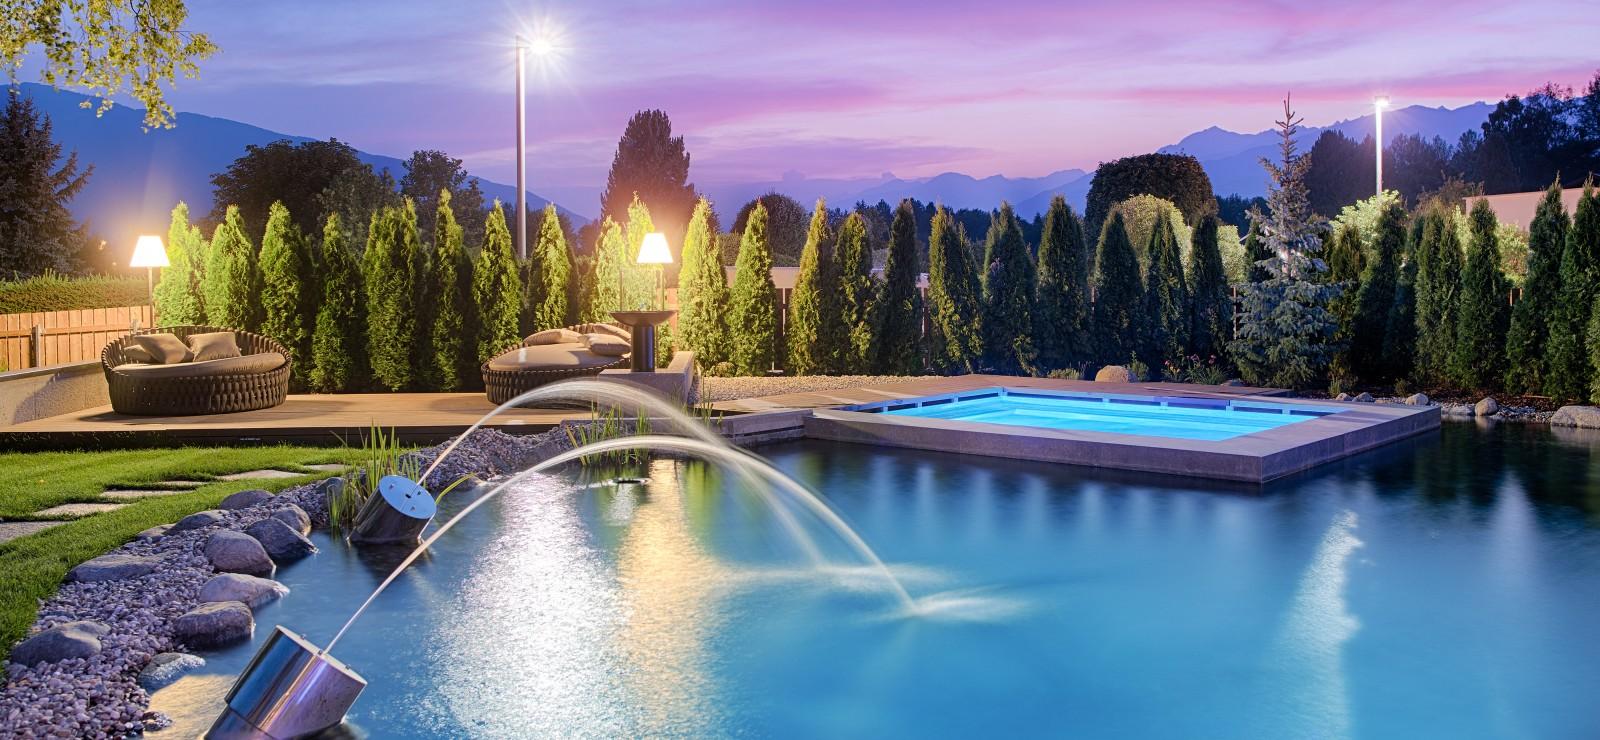 Das Majestic Hotel & Spa Bilder | Bild 1